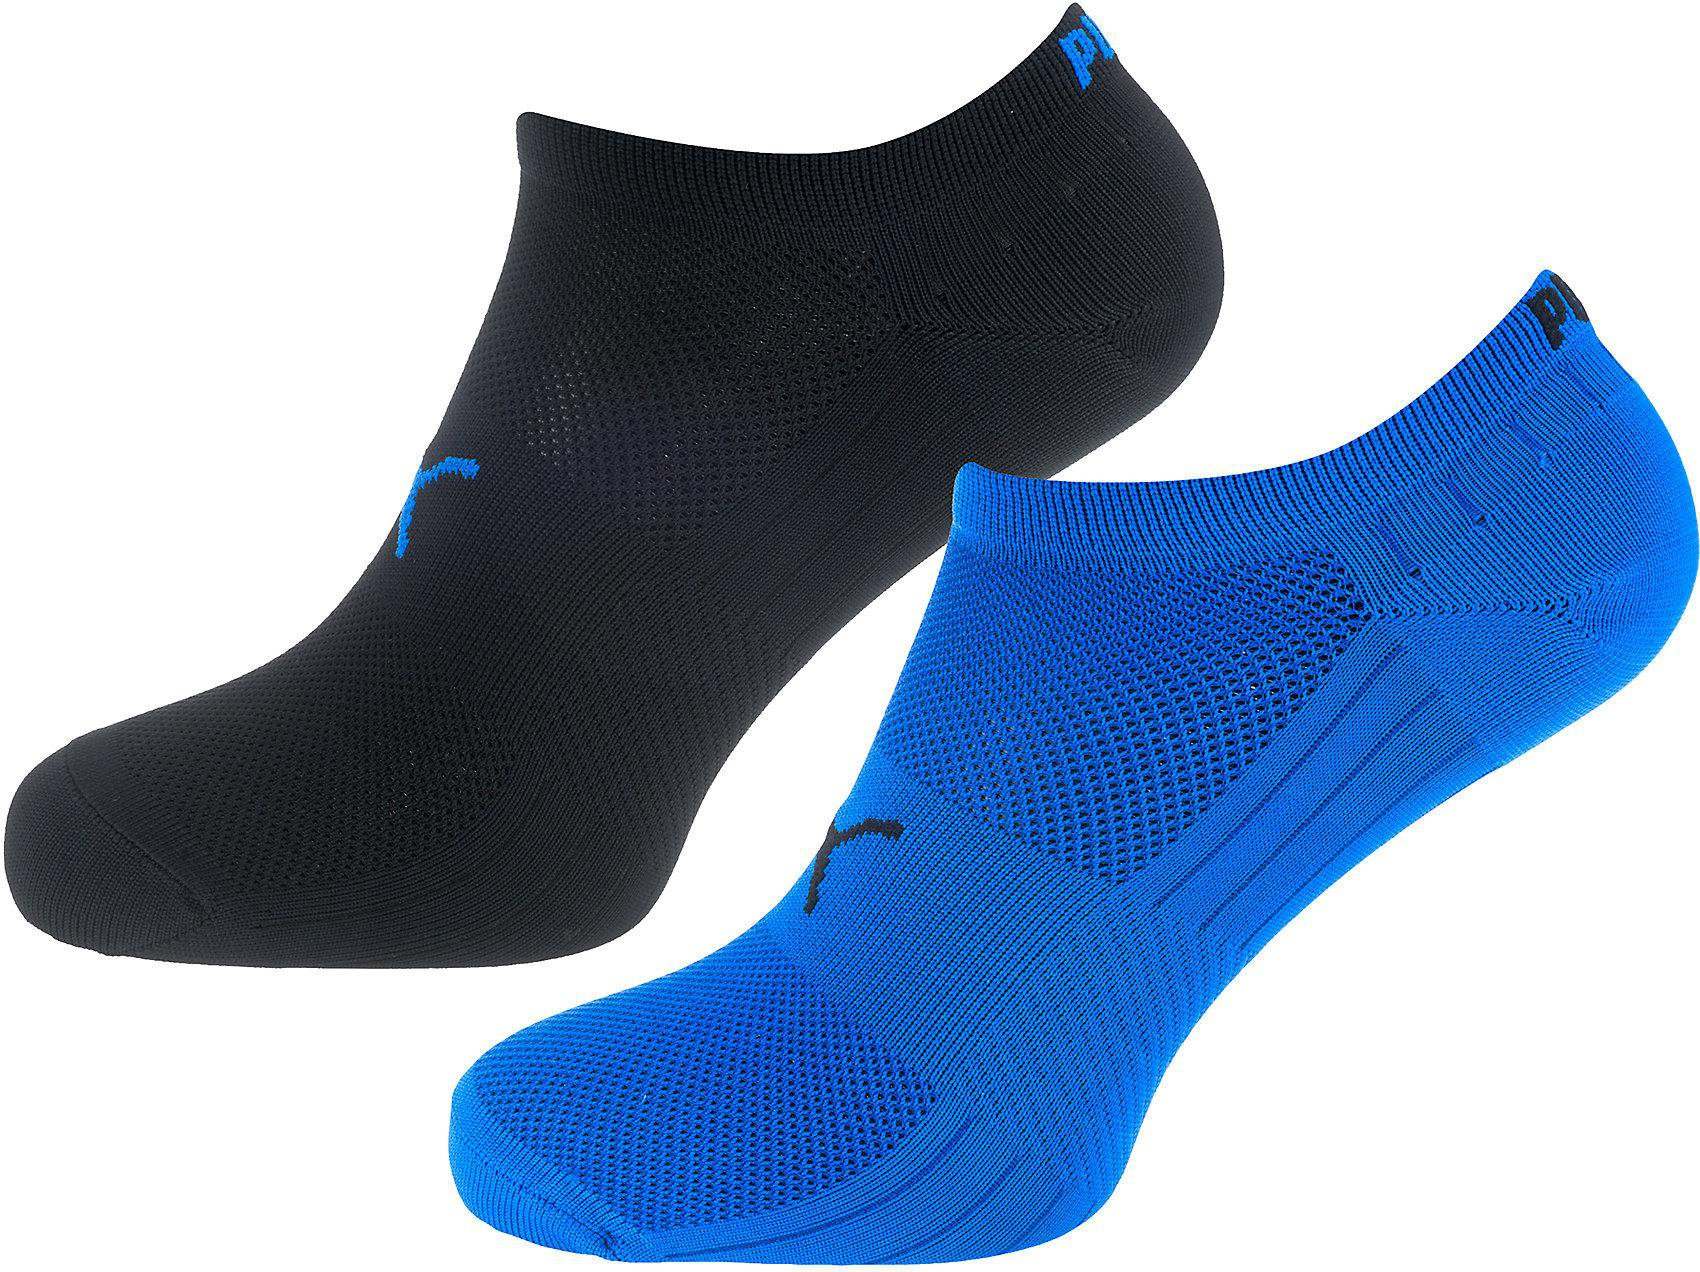 5b14fe5ddc Puma Sneaker Socken Herren kaufen | Günstig im Preisvergleich puma sneaker  socken herren weiss